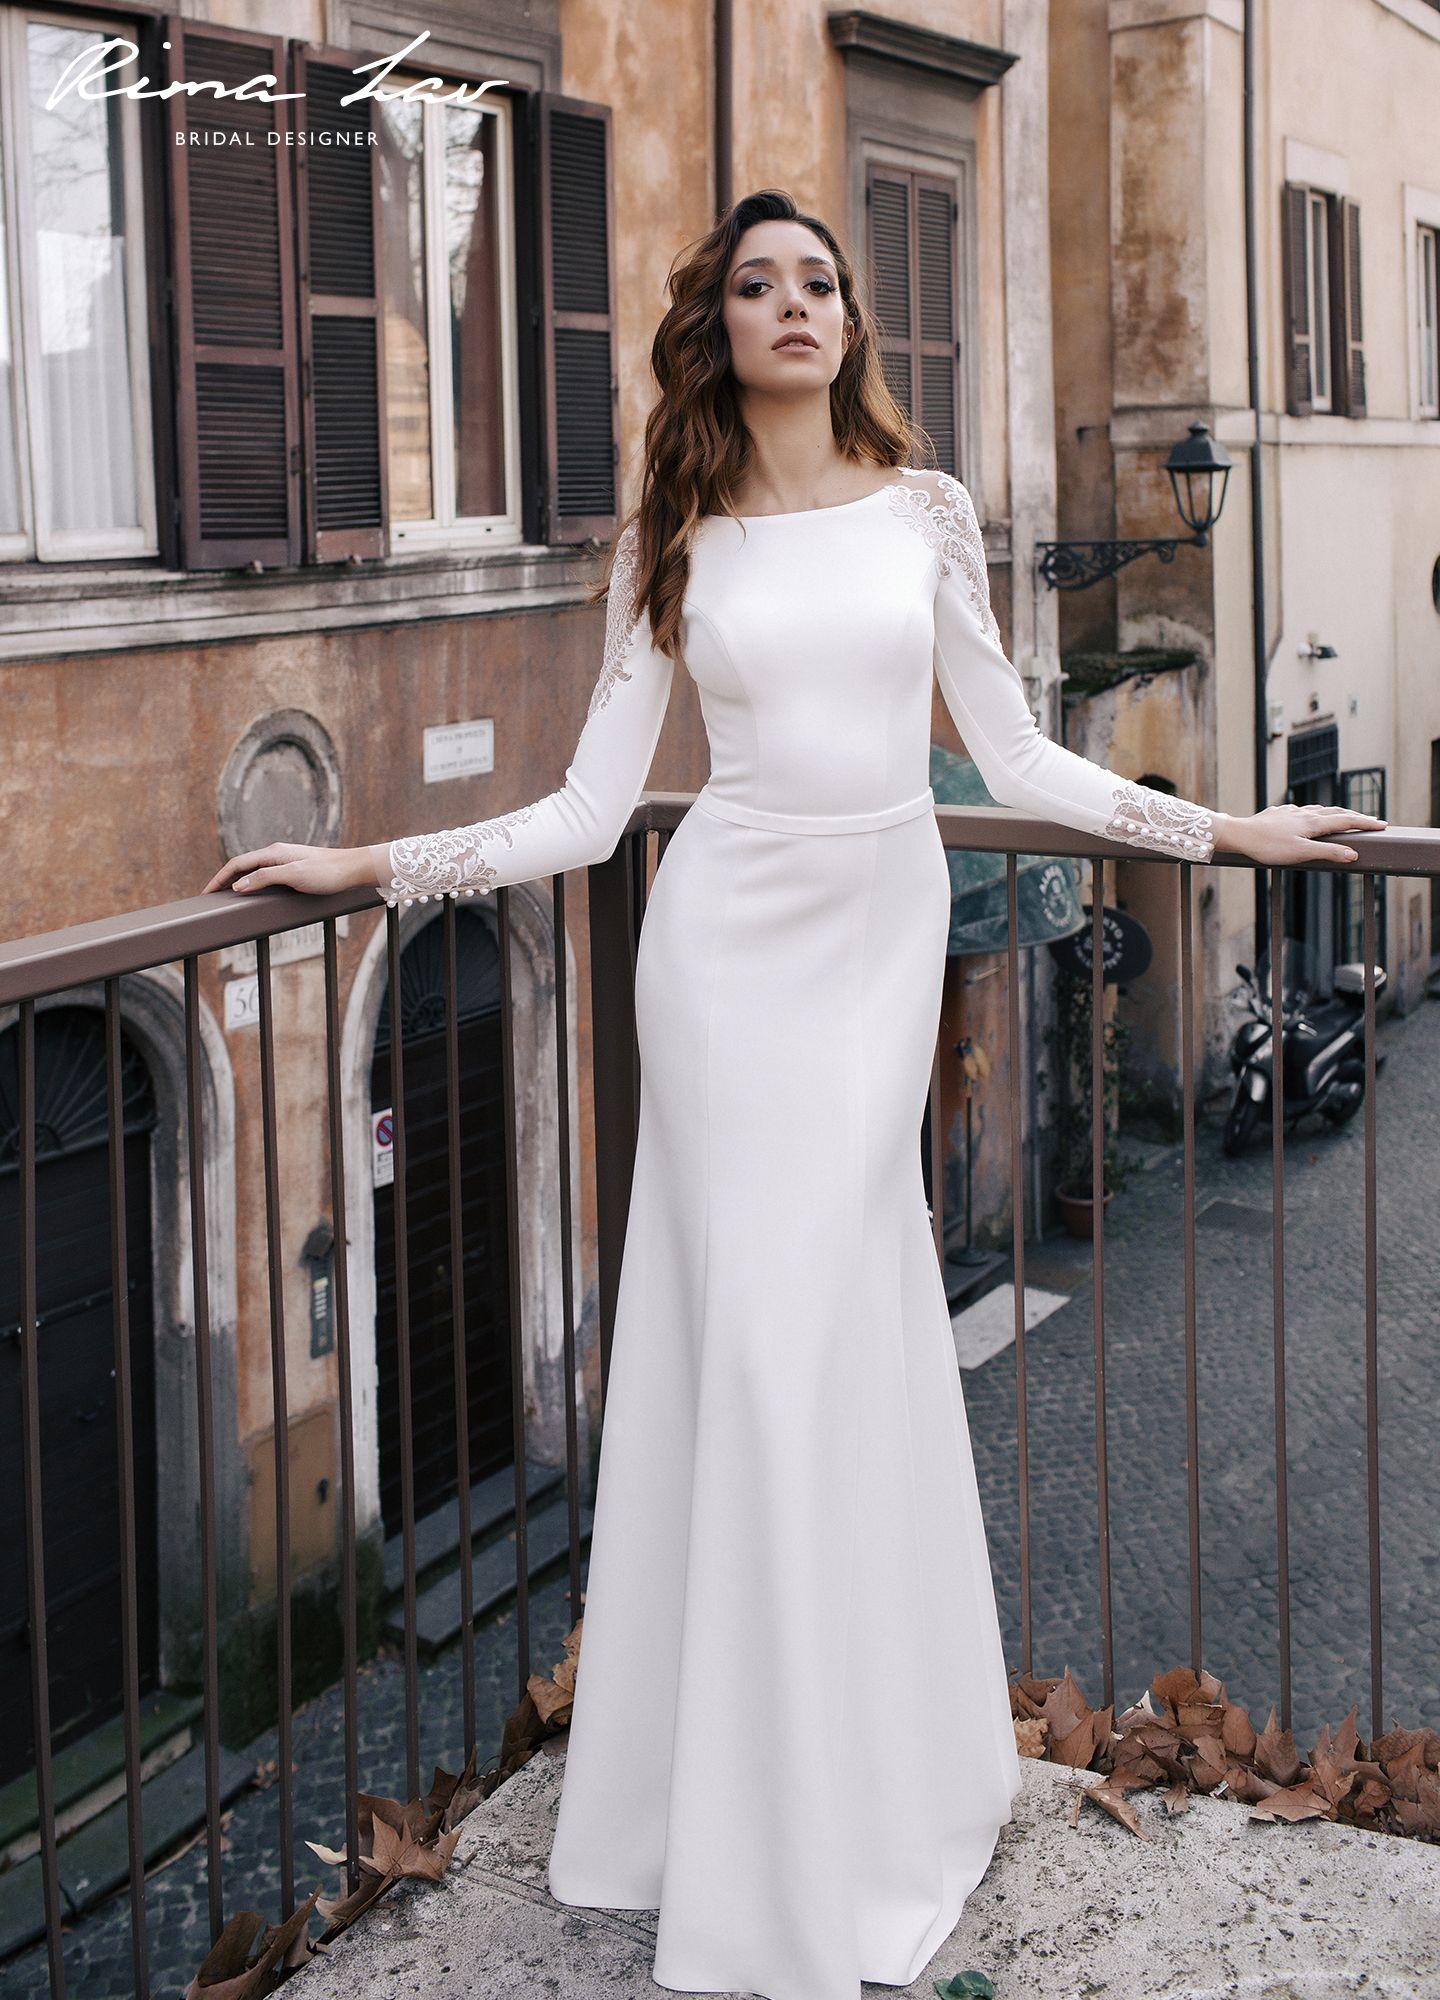 Rima Lav Wedding Dresses Evora Plain Wedding Dress Wedding Dresses Wedding Dresses Satin [ 2000 x 1440 Pixel ]